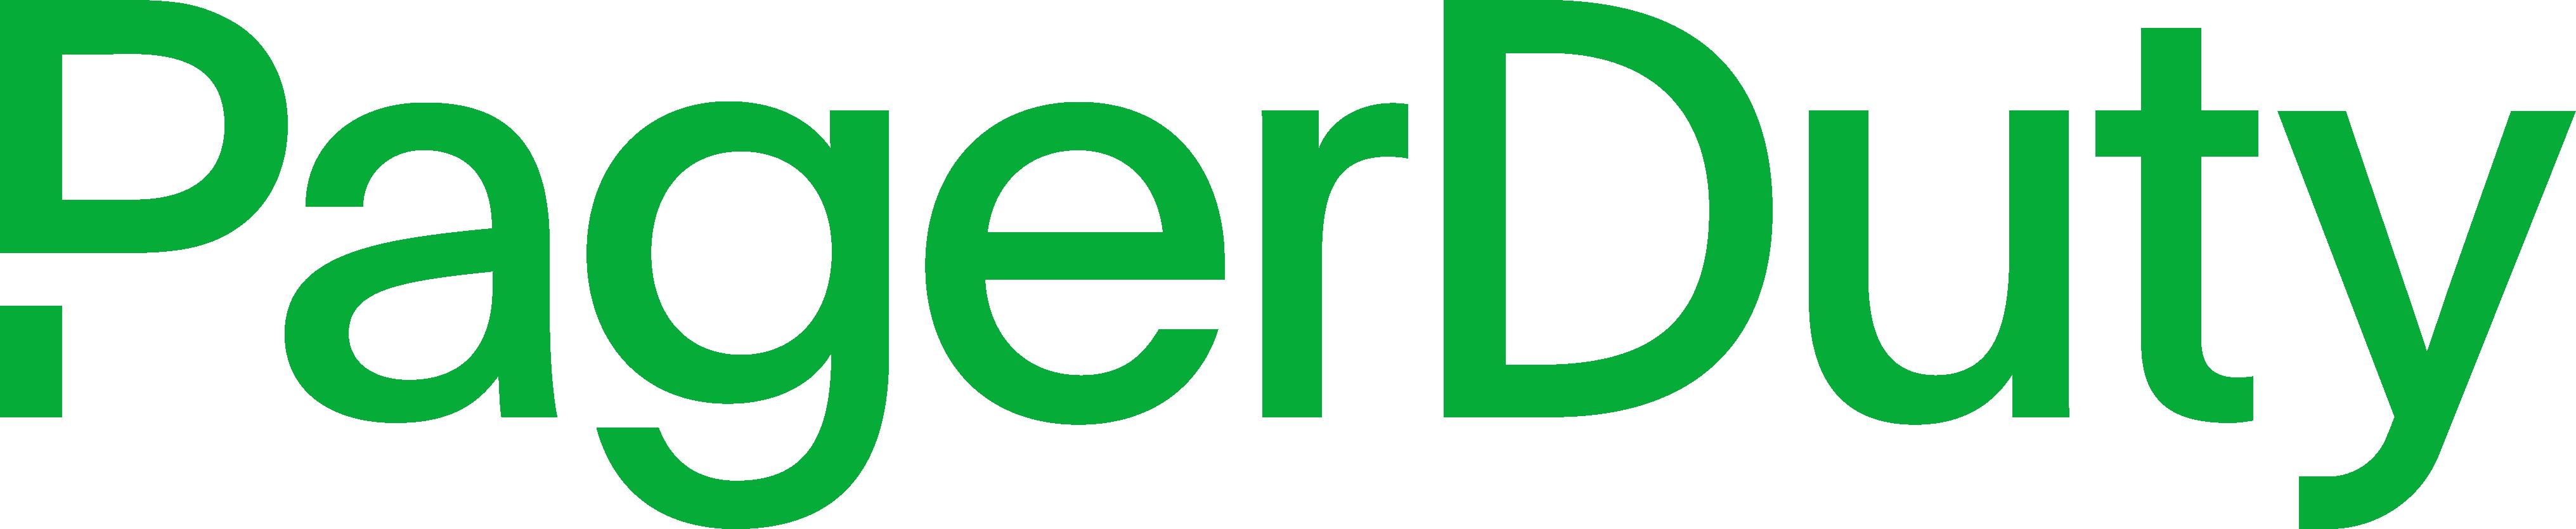 PagerDuty GreenRGB 3x